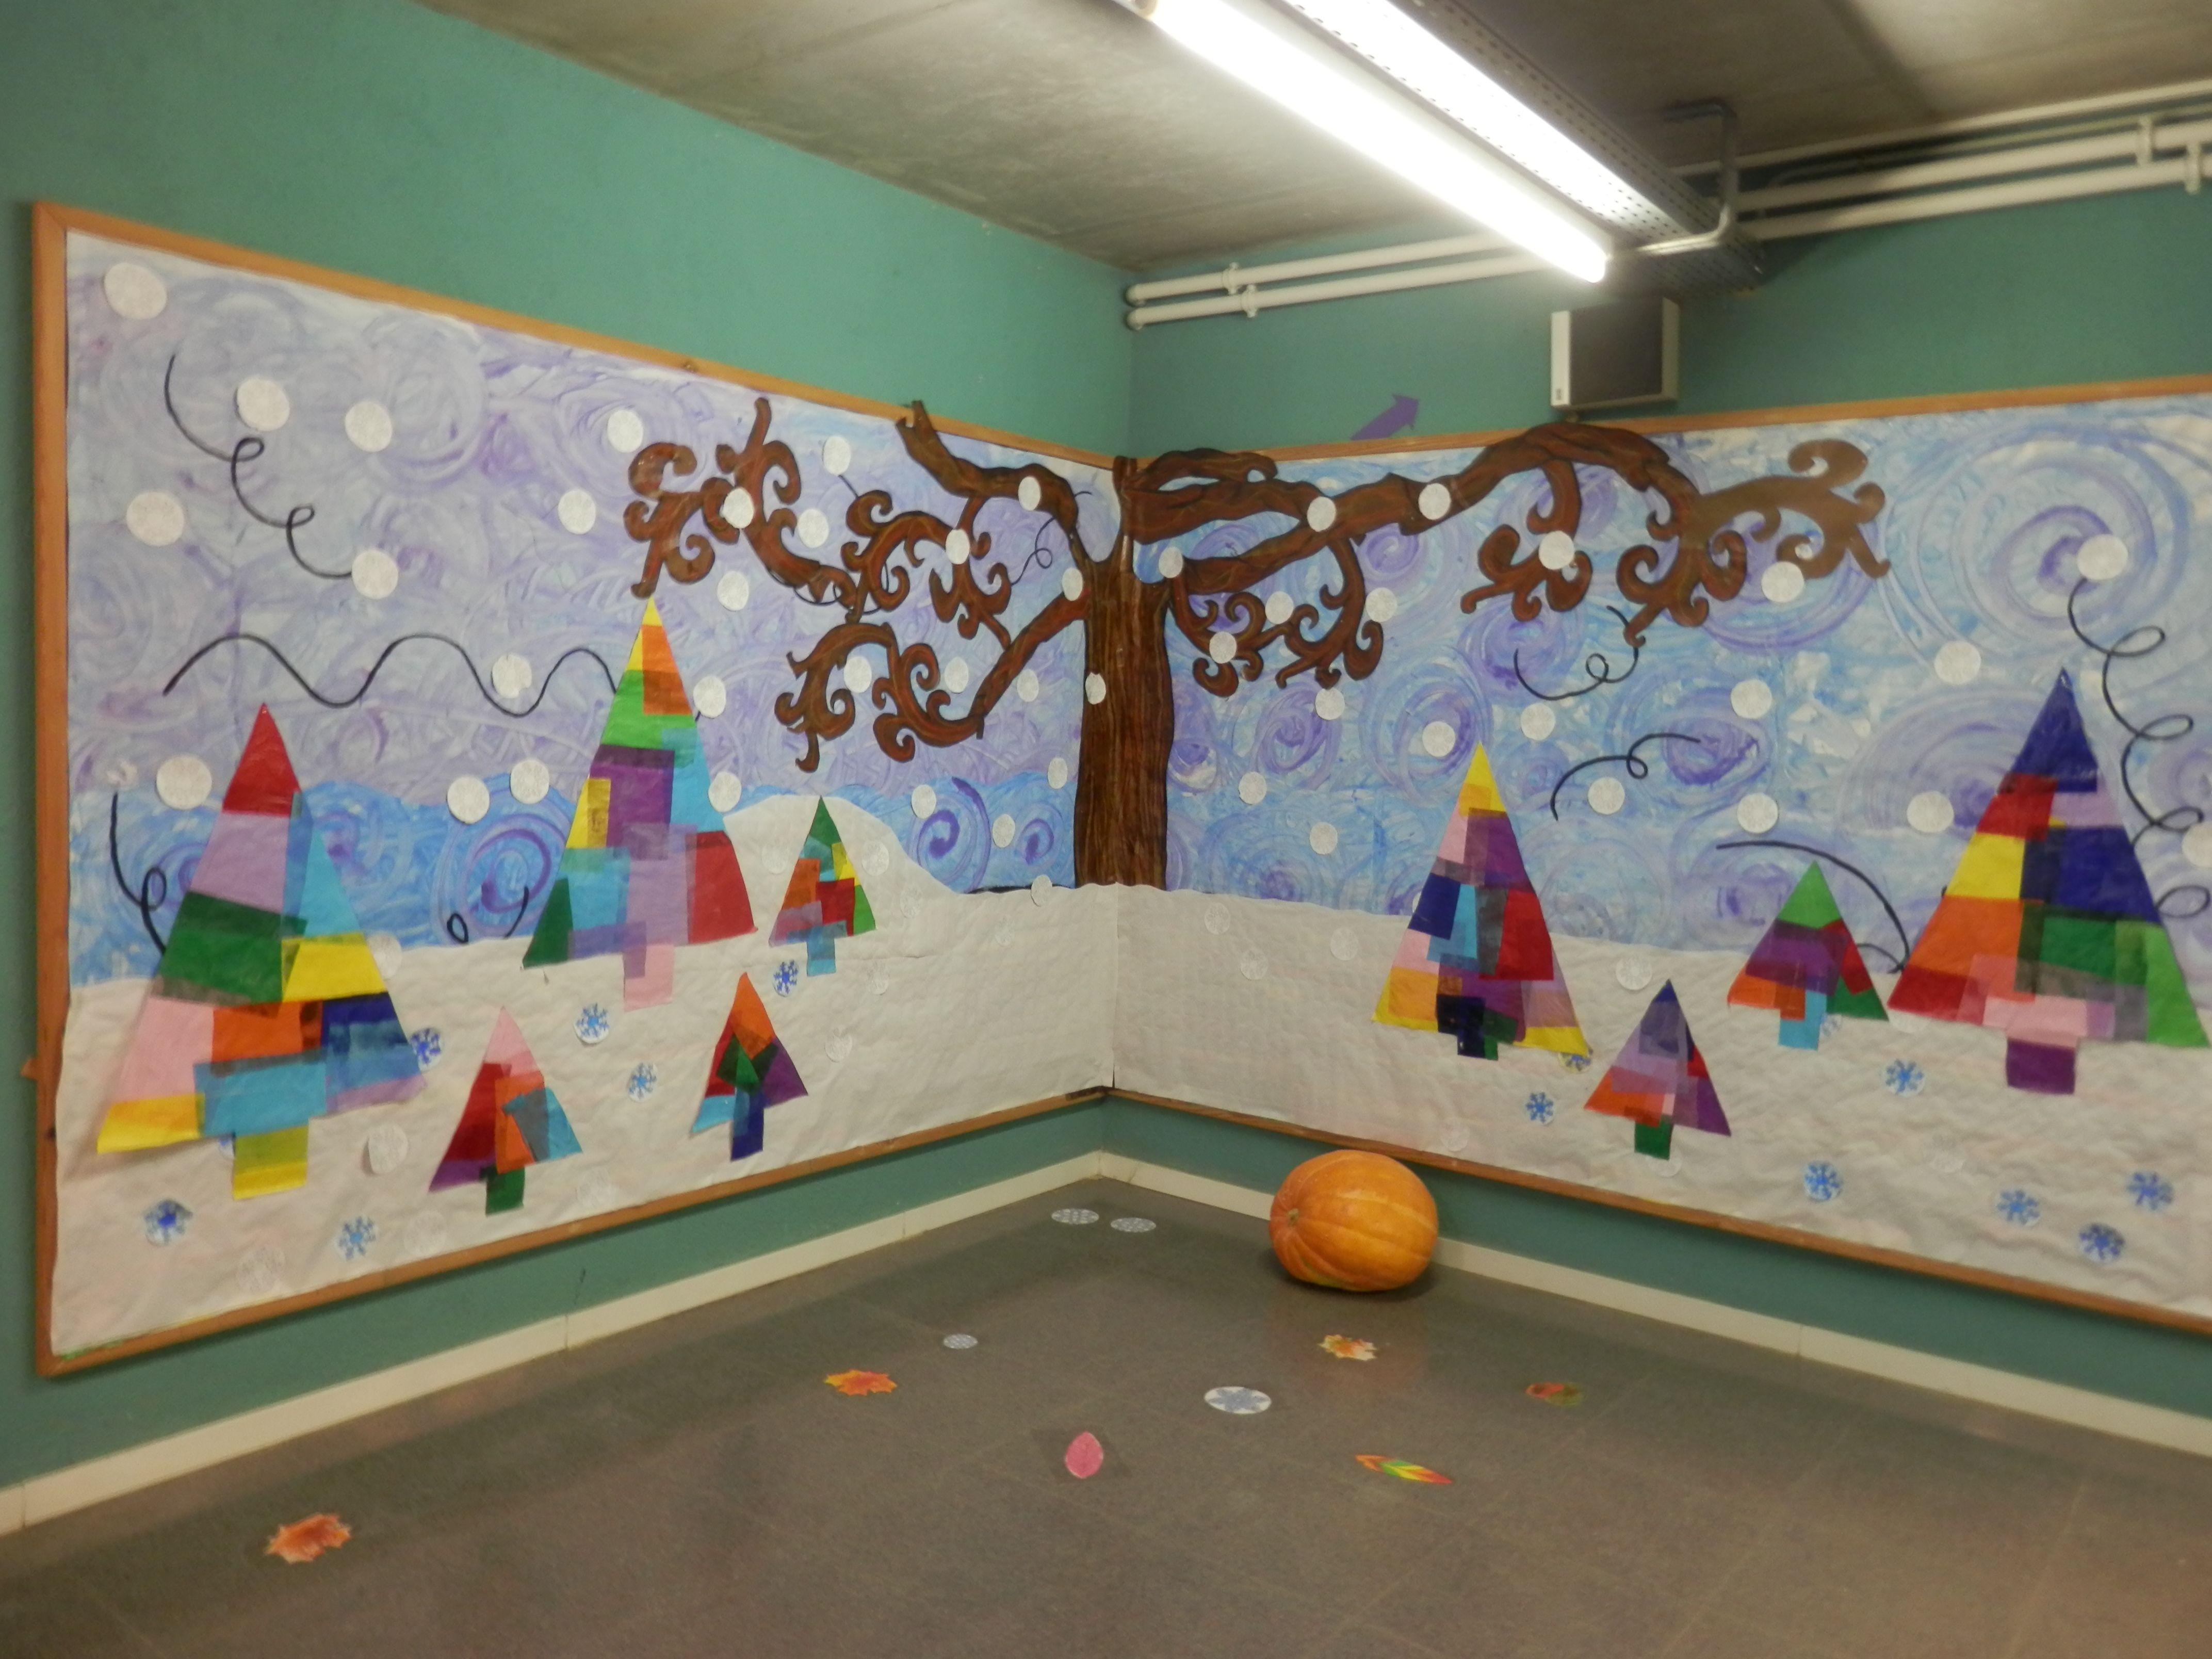 Mural hivern mural hivern pinterest invierno - Murales decorativos de navidad ...